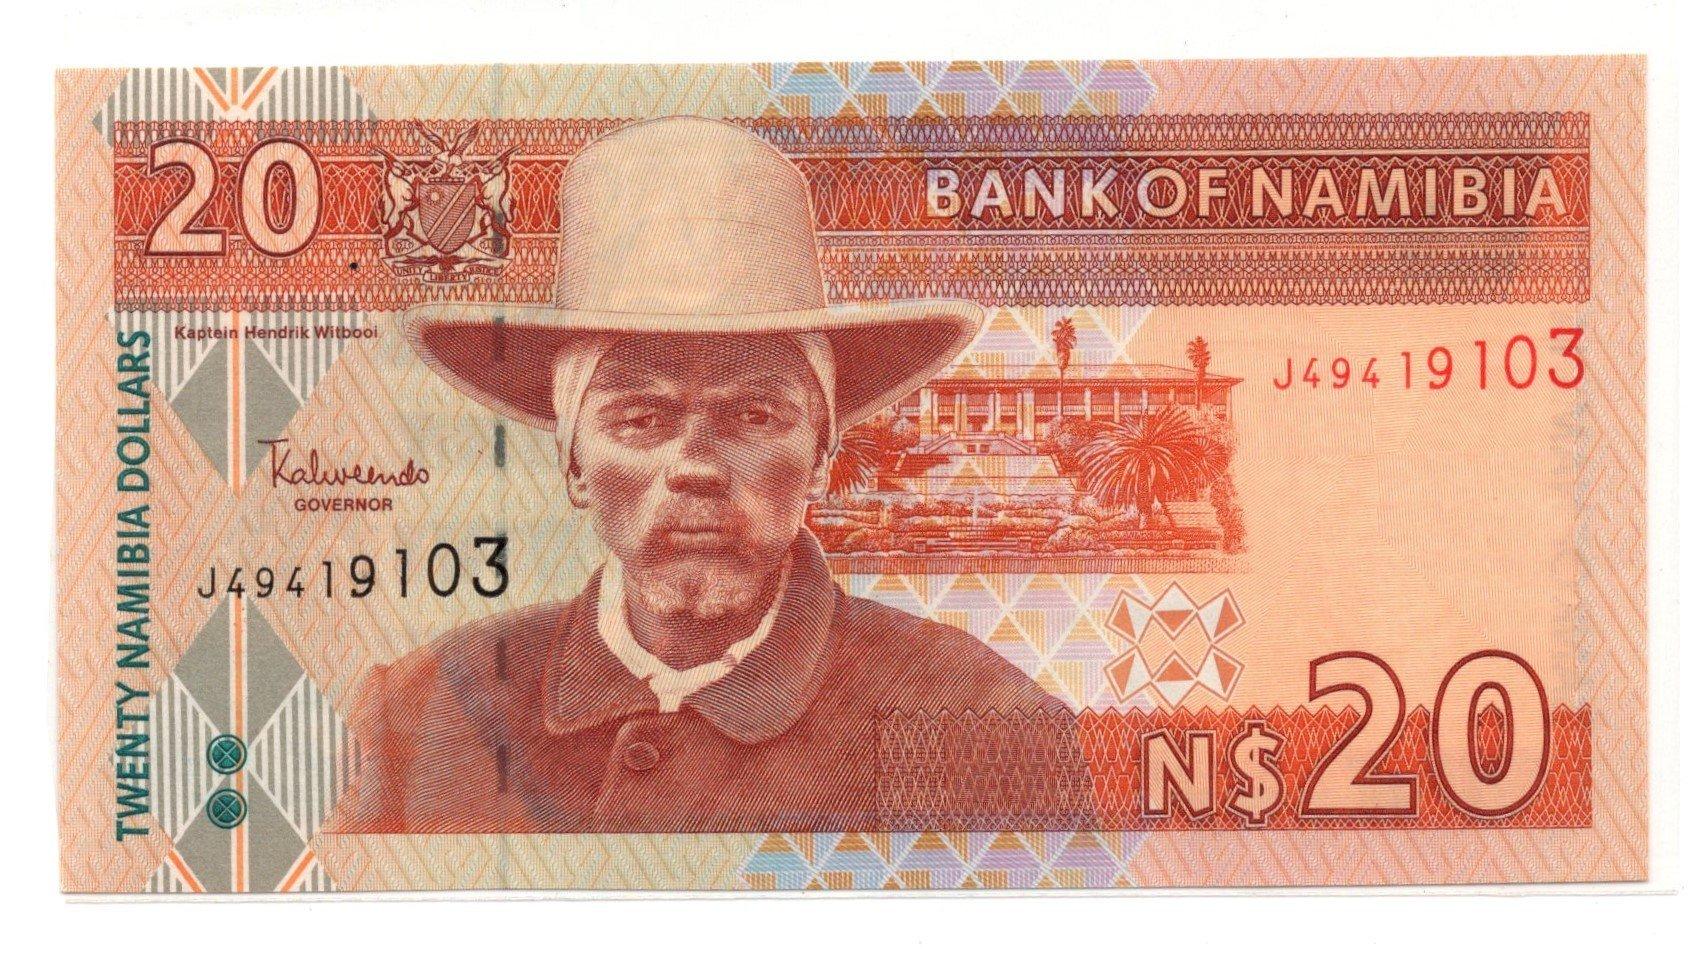 namibia 20 dollars banknote